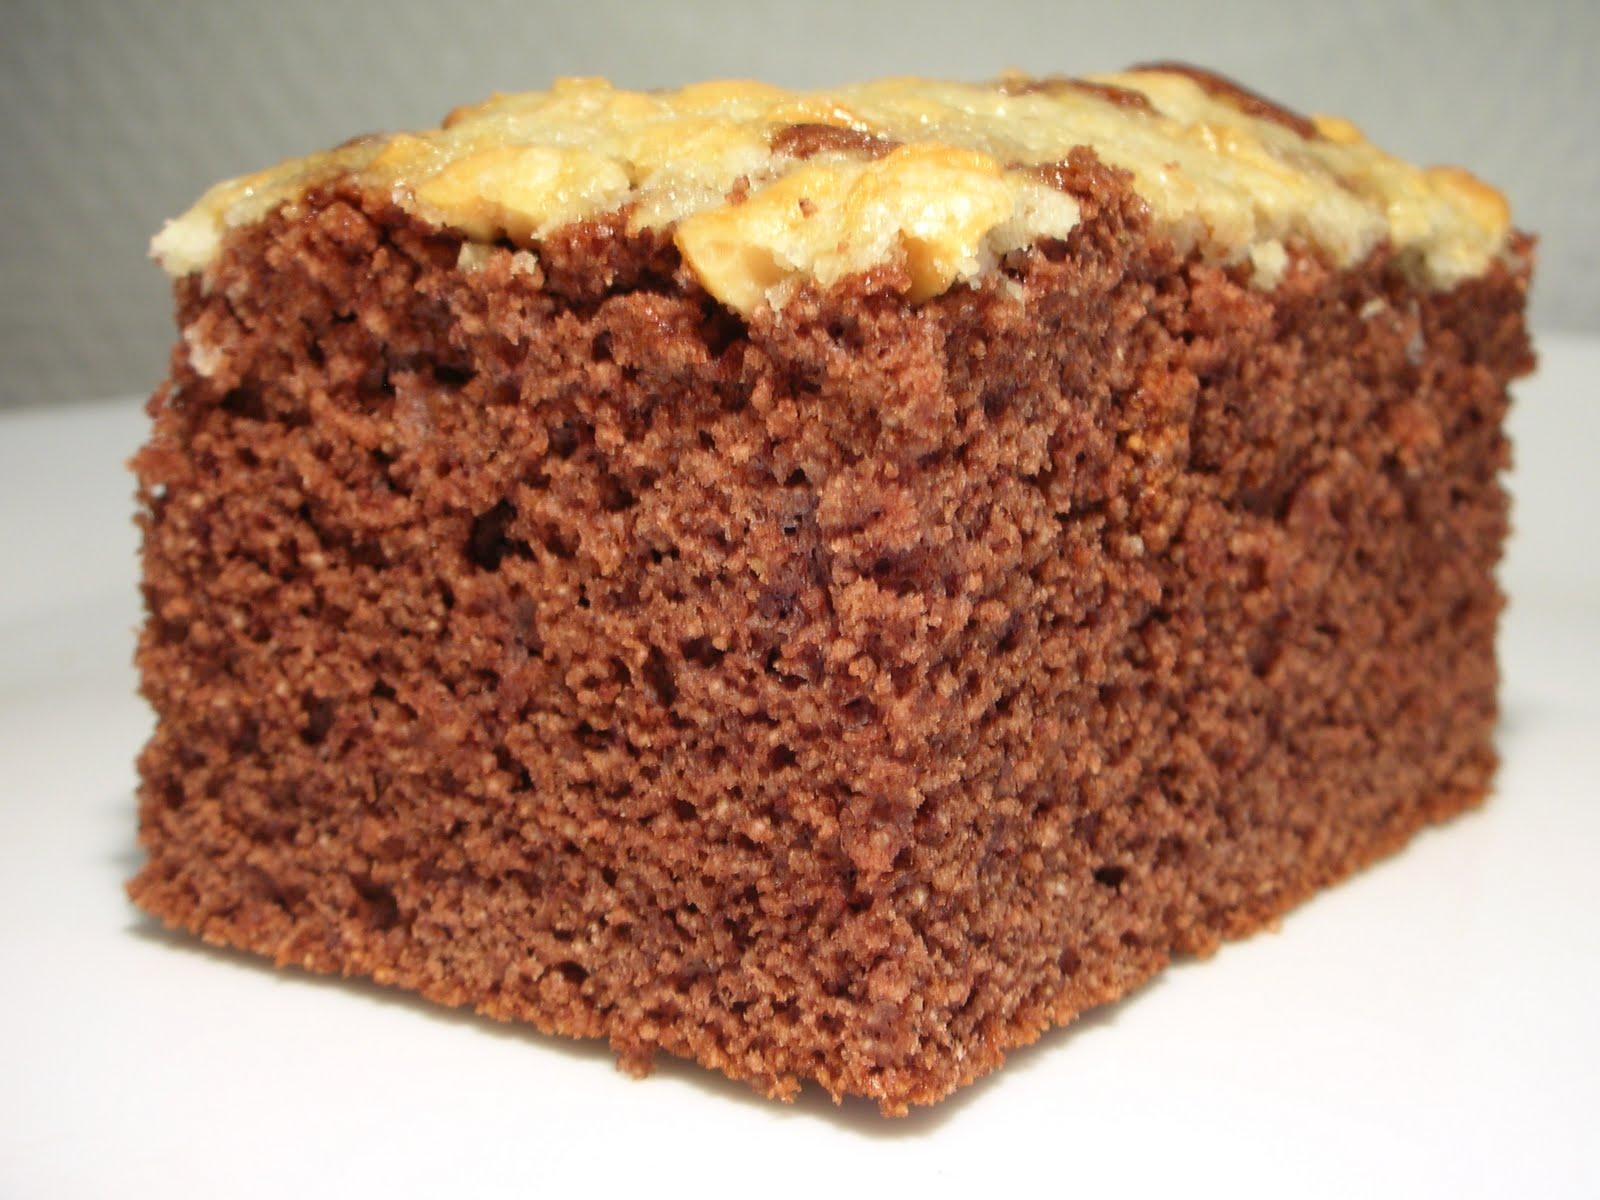 Crumbs Chocolate Cake